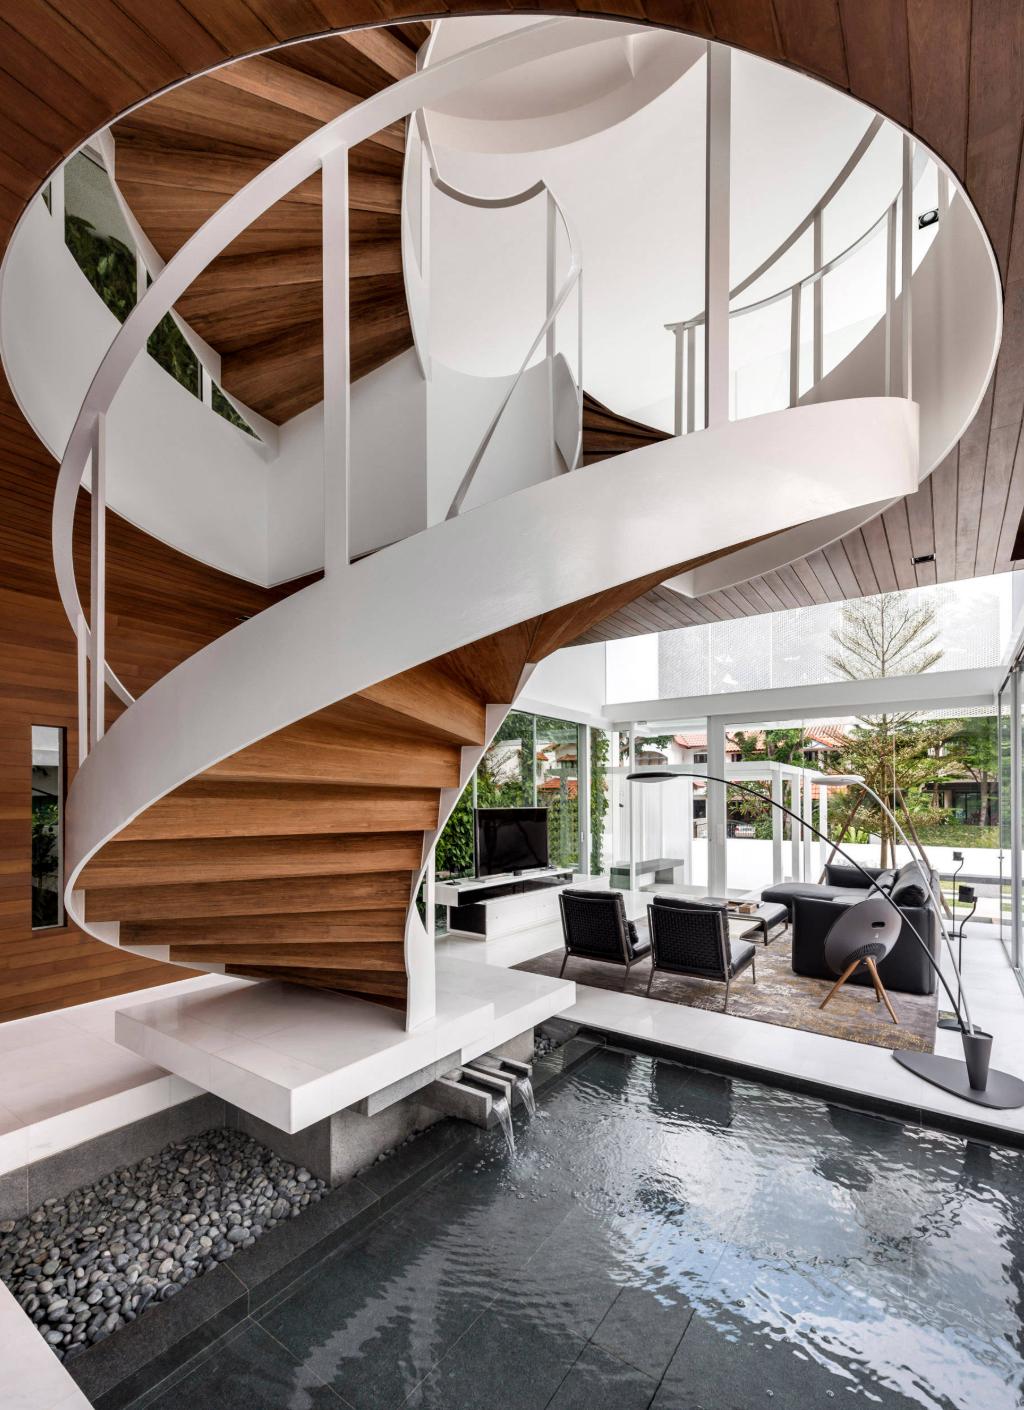 Pond below a modern staircase.